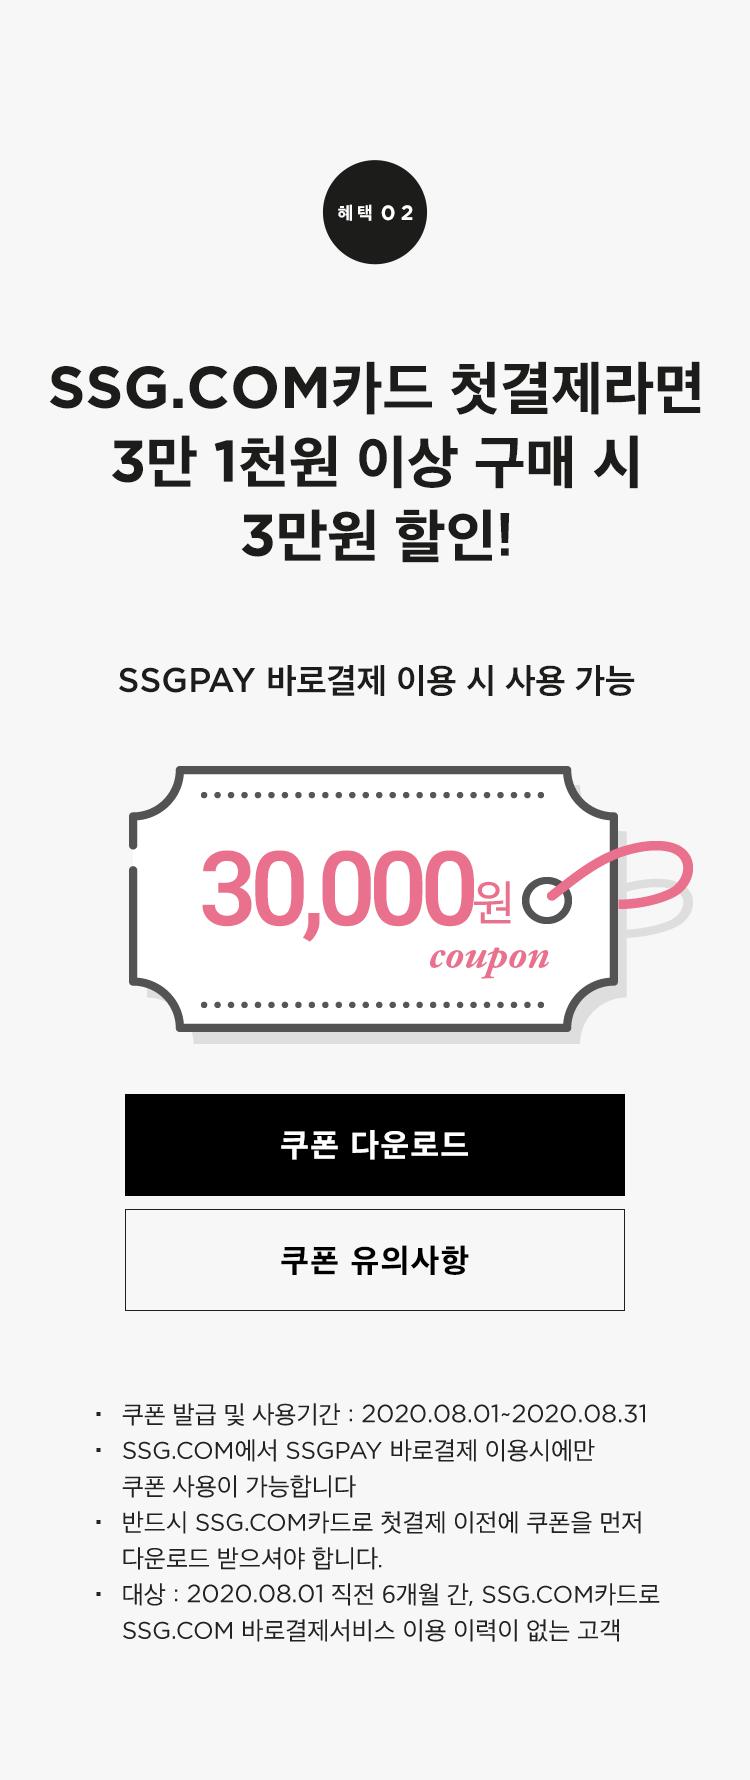 SSGPAY 바로결제 이용 시 사용가능 30,000원 할인쿠폰